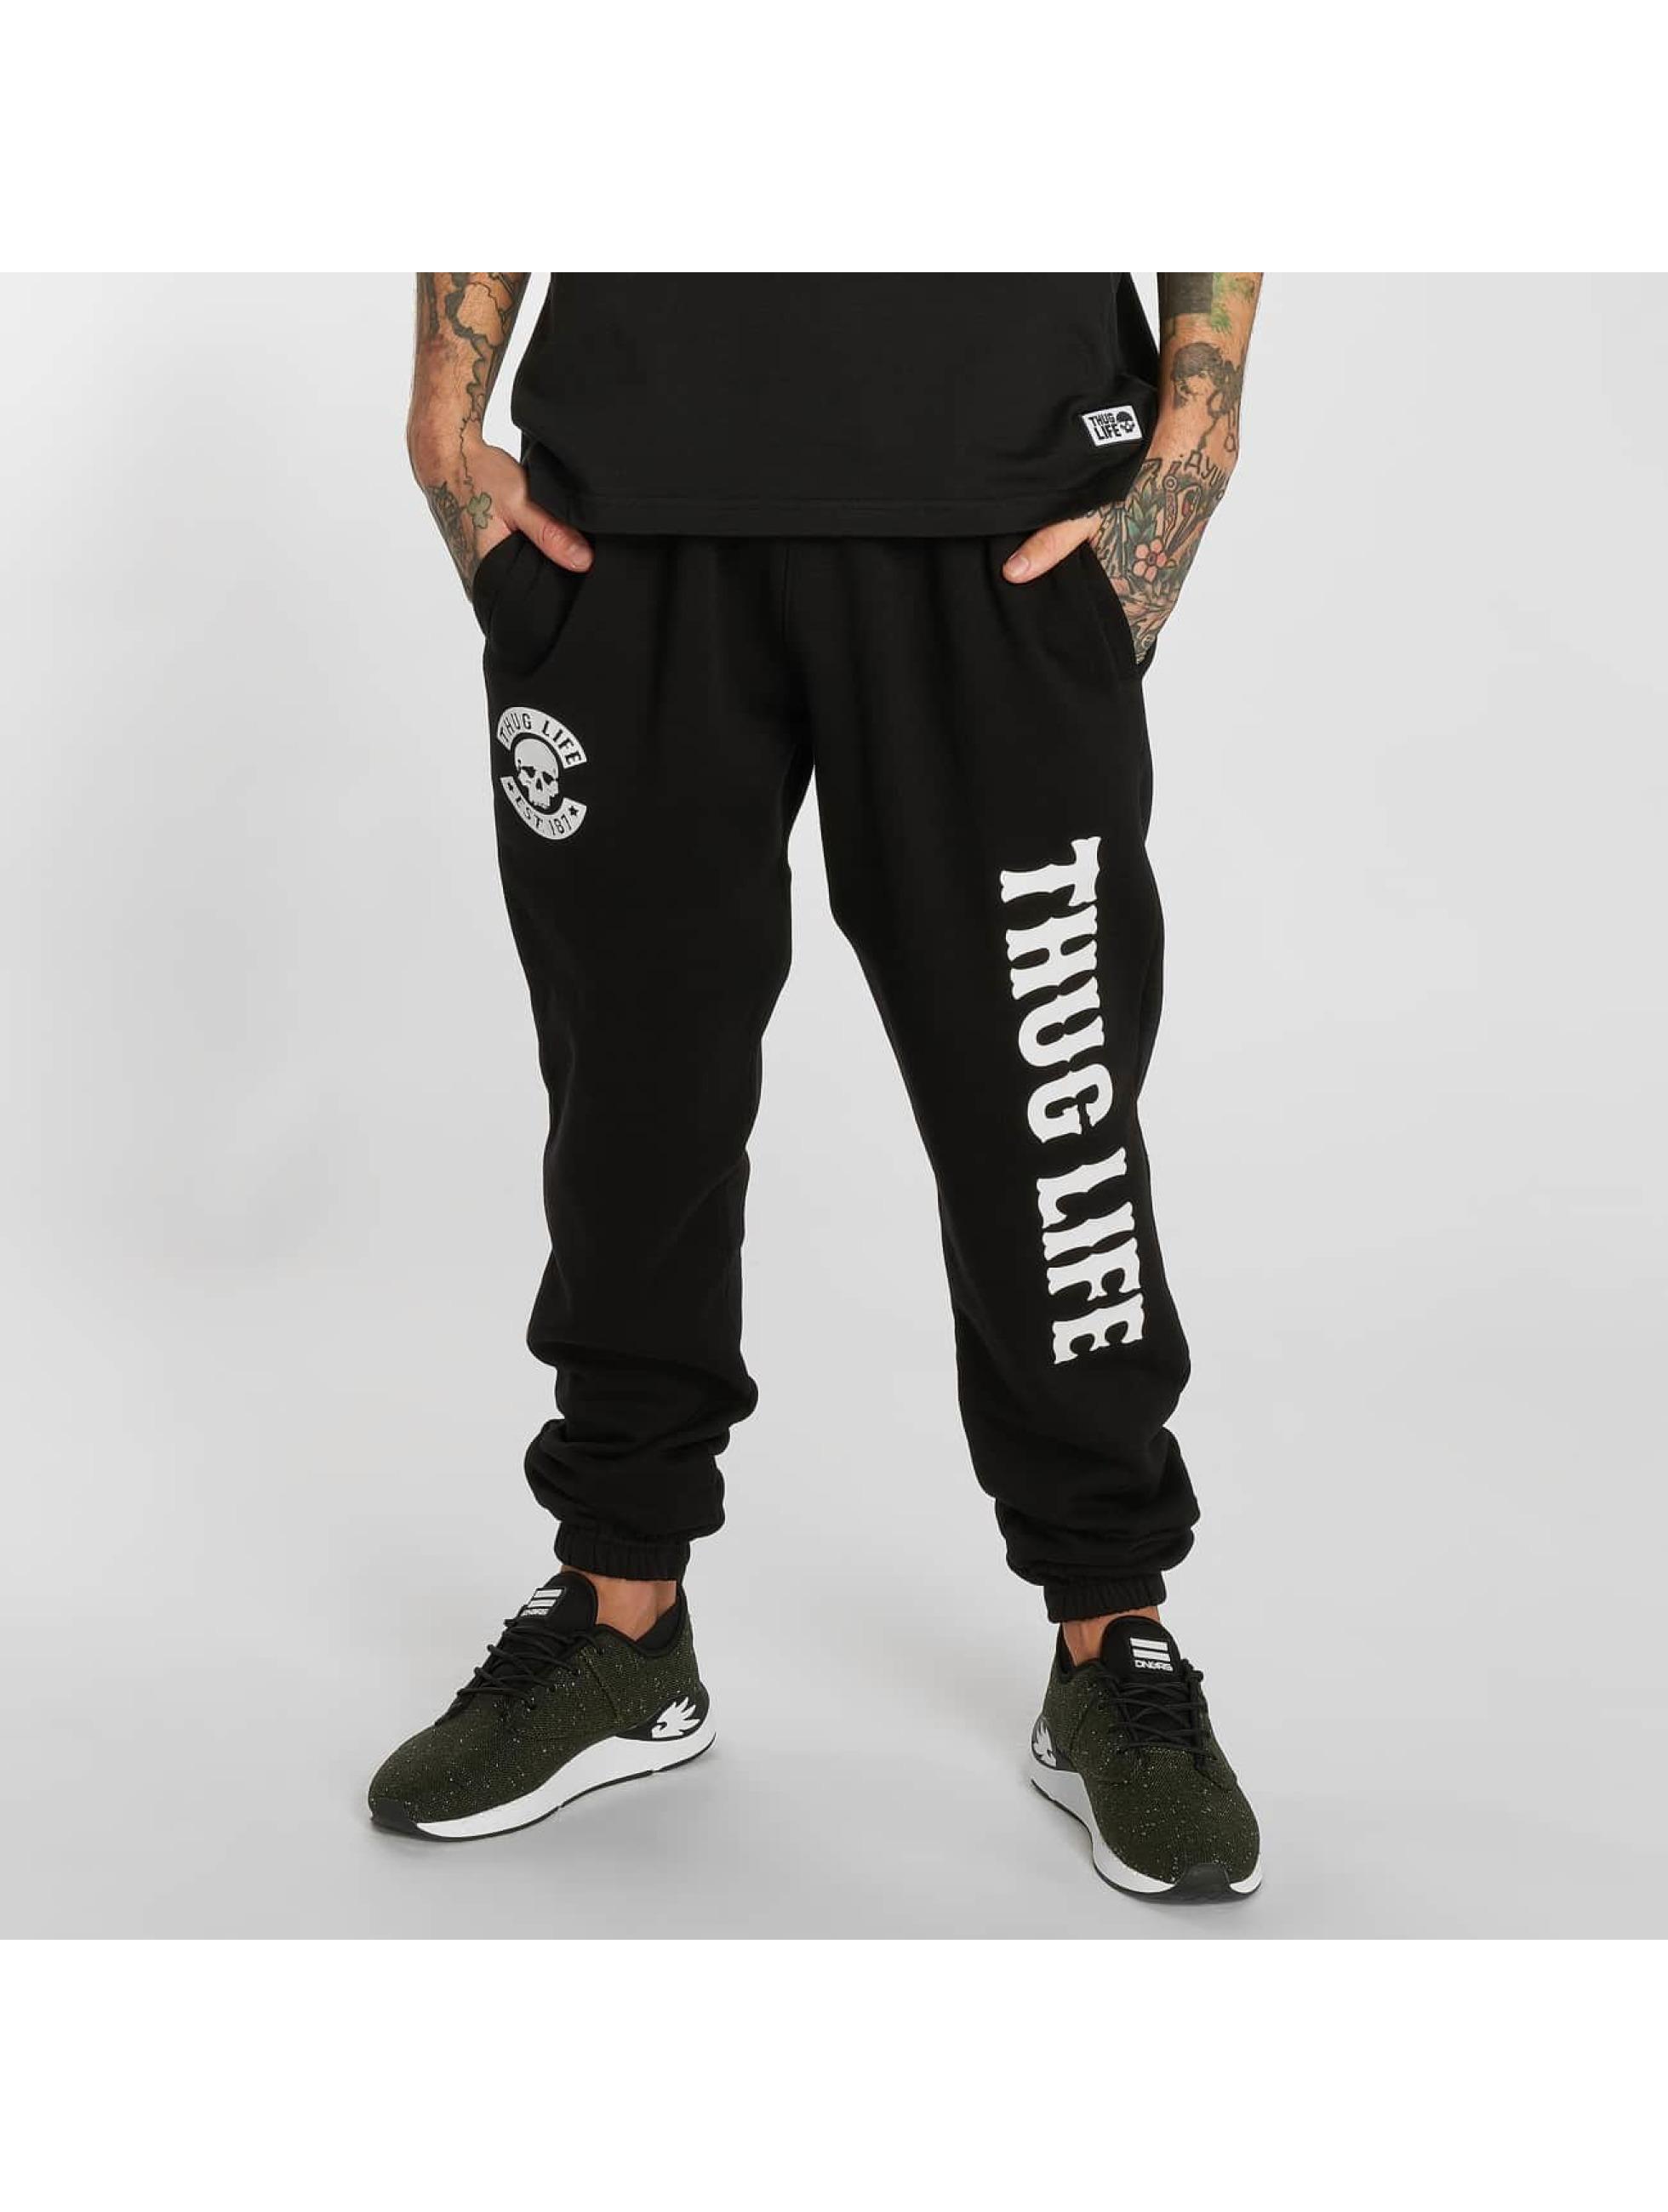 Thug Life / Sweat Pant TLSP124 in black S